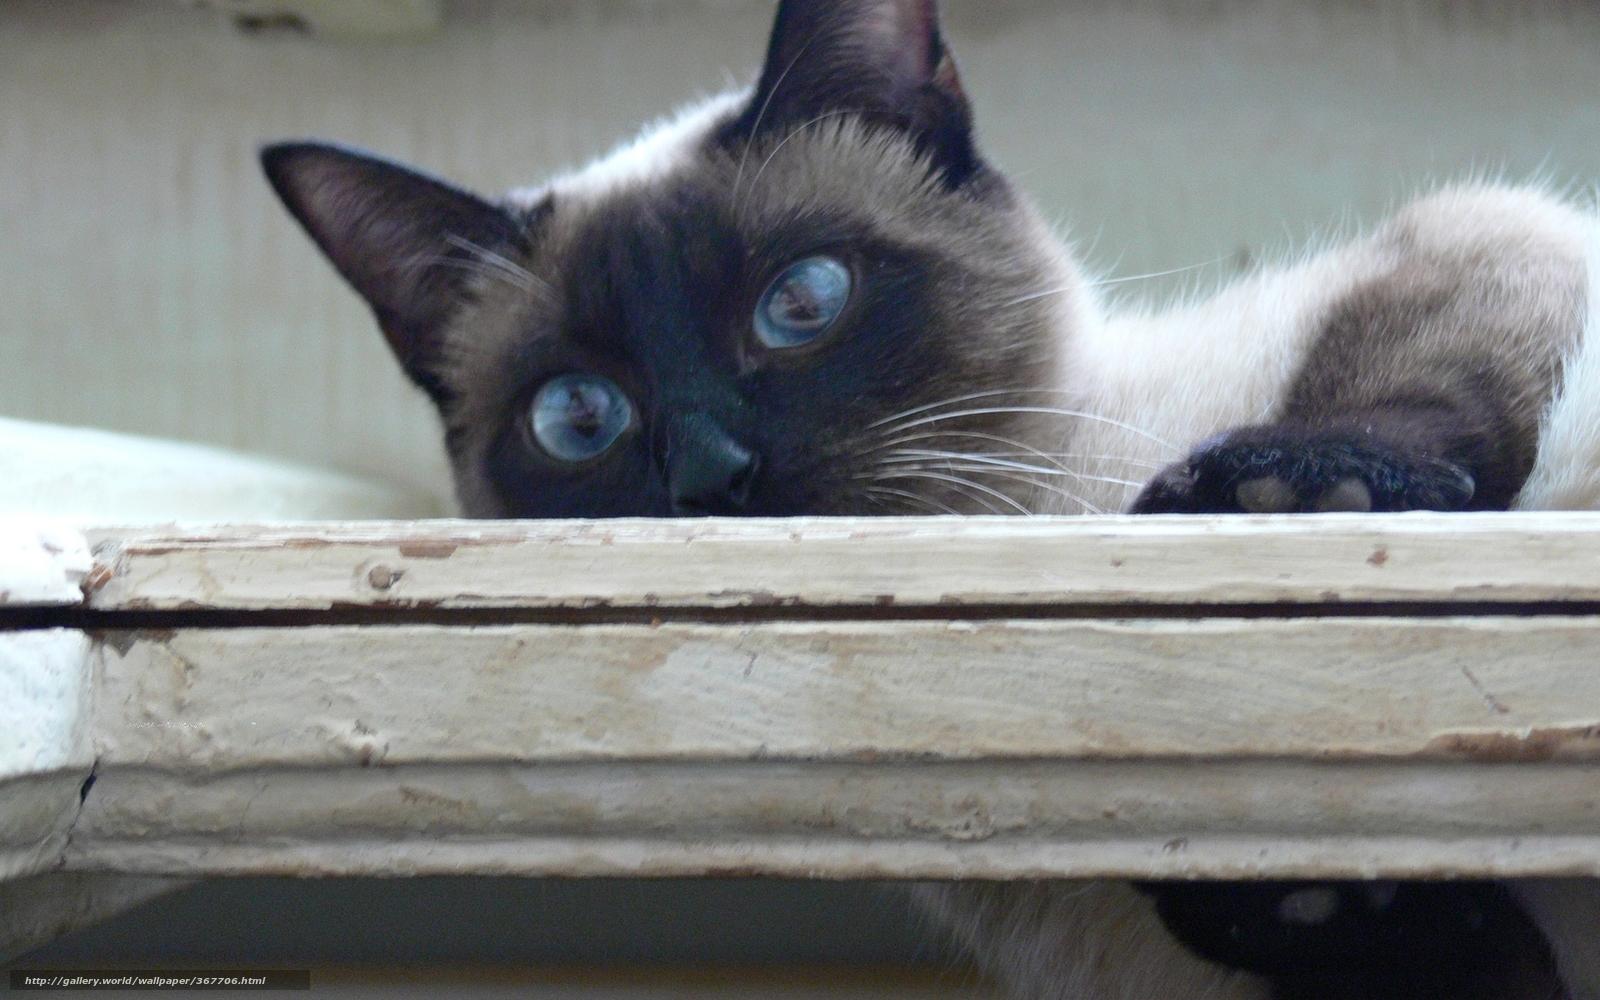 Download wallpaper cat, animal, Tasia, Siamese free